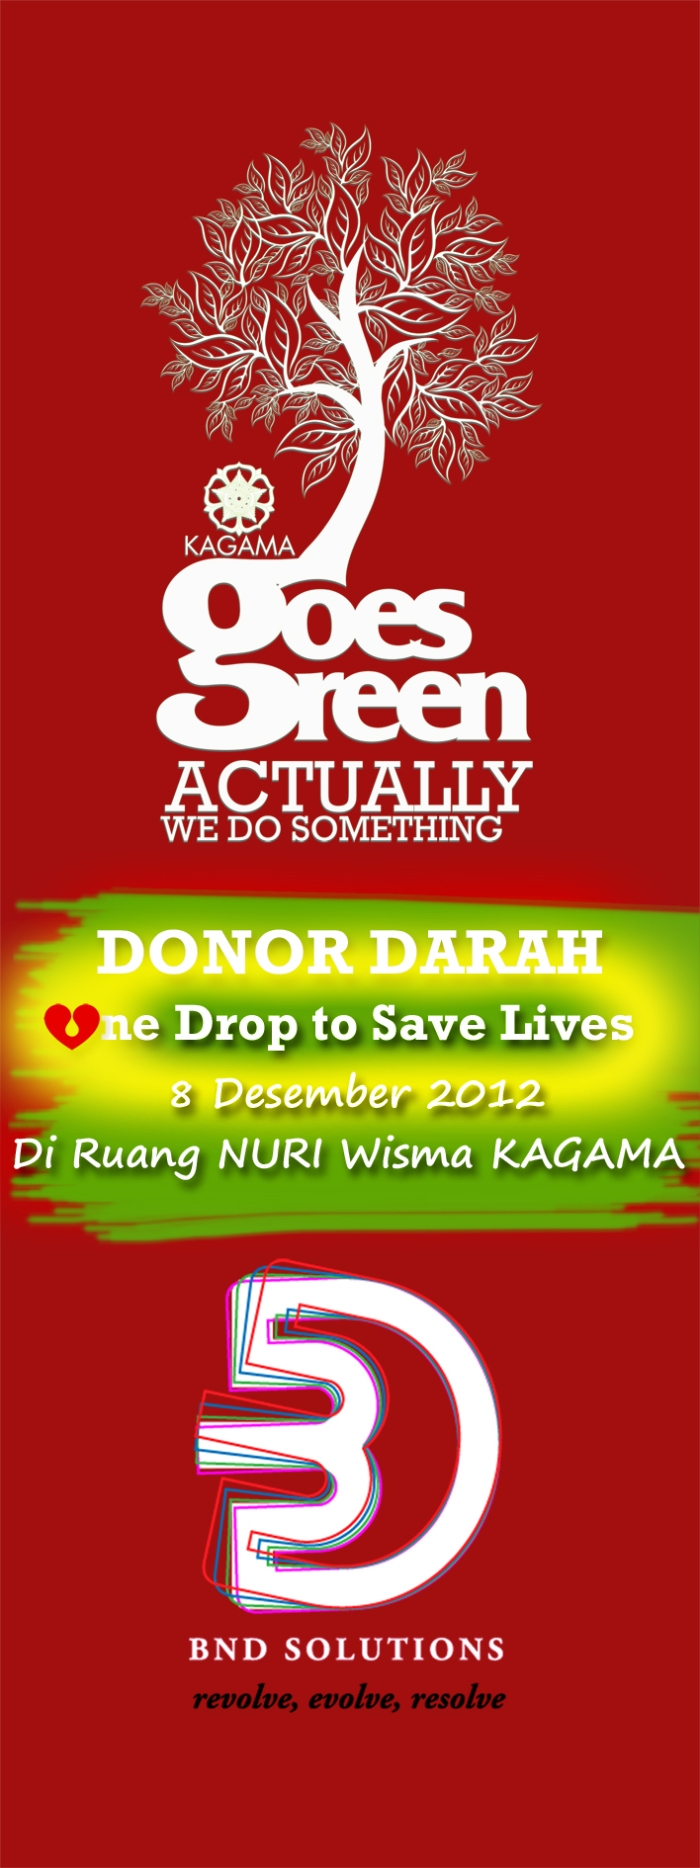 XBanner Donor Darah